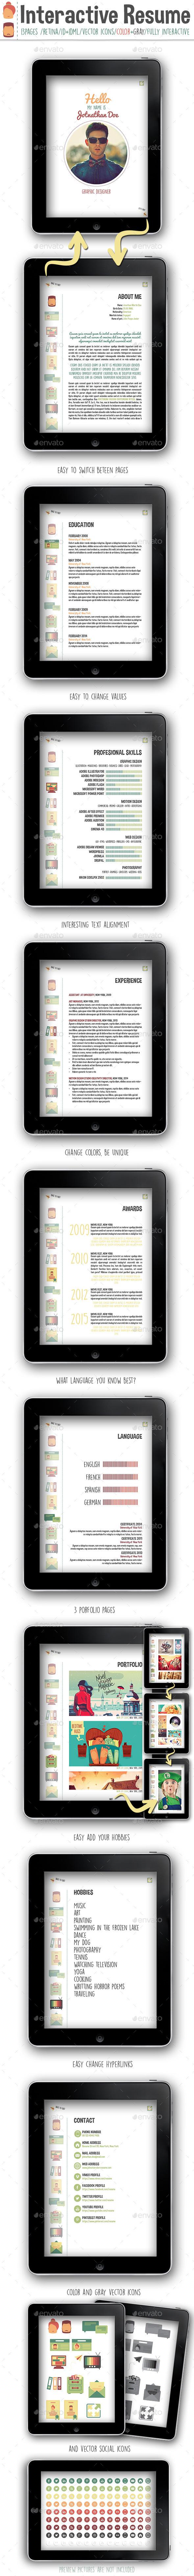 Interactive Resume PDF